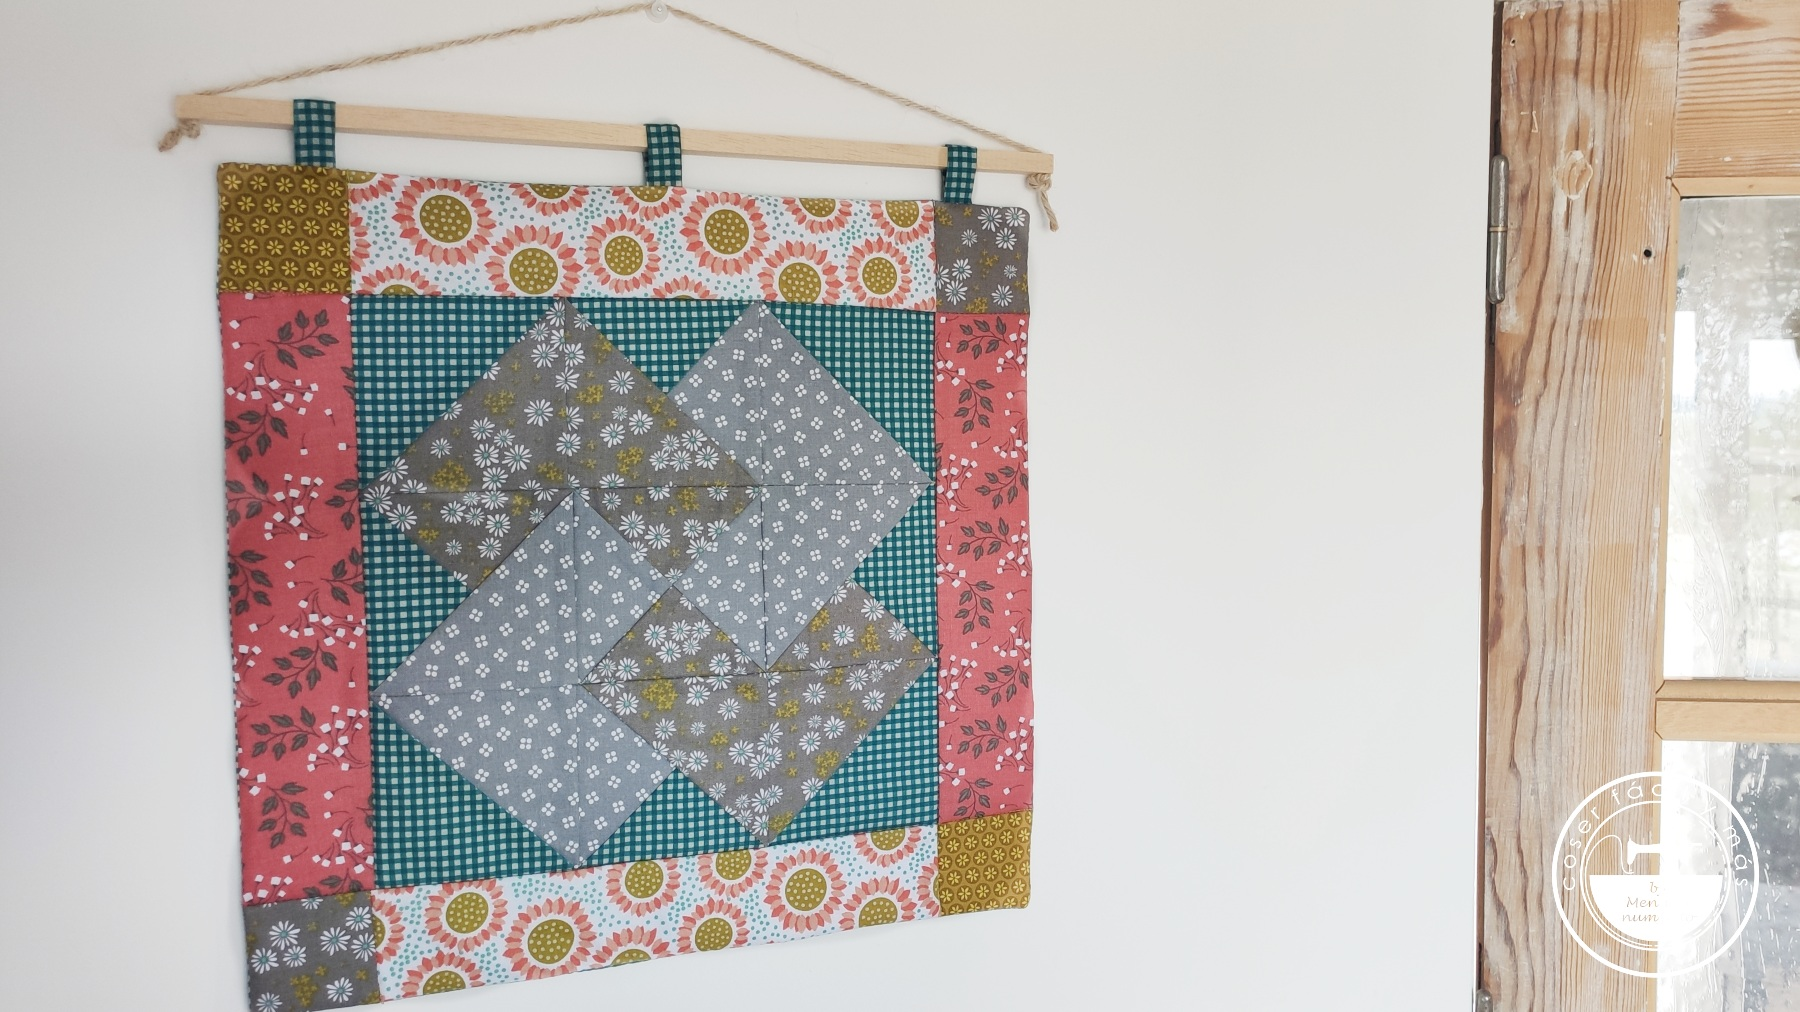 tapiz de pared juego de cartas patchwork menudo numerito blogs de costura